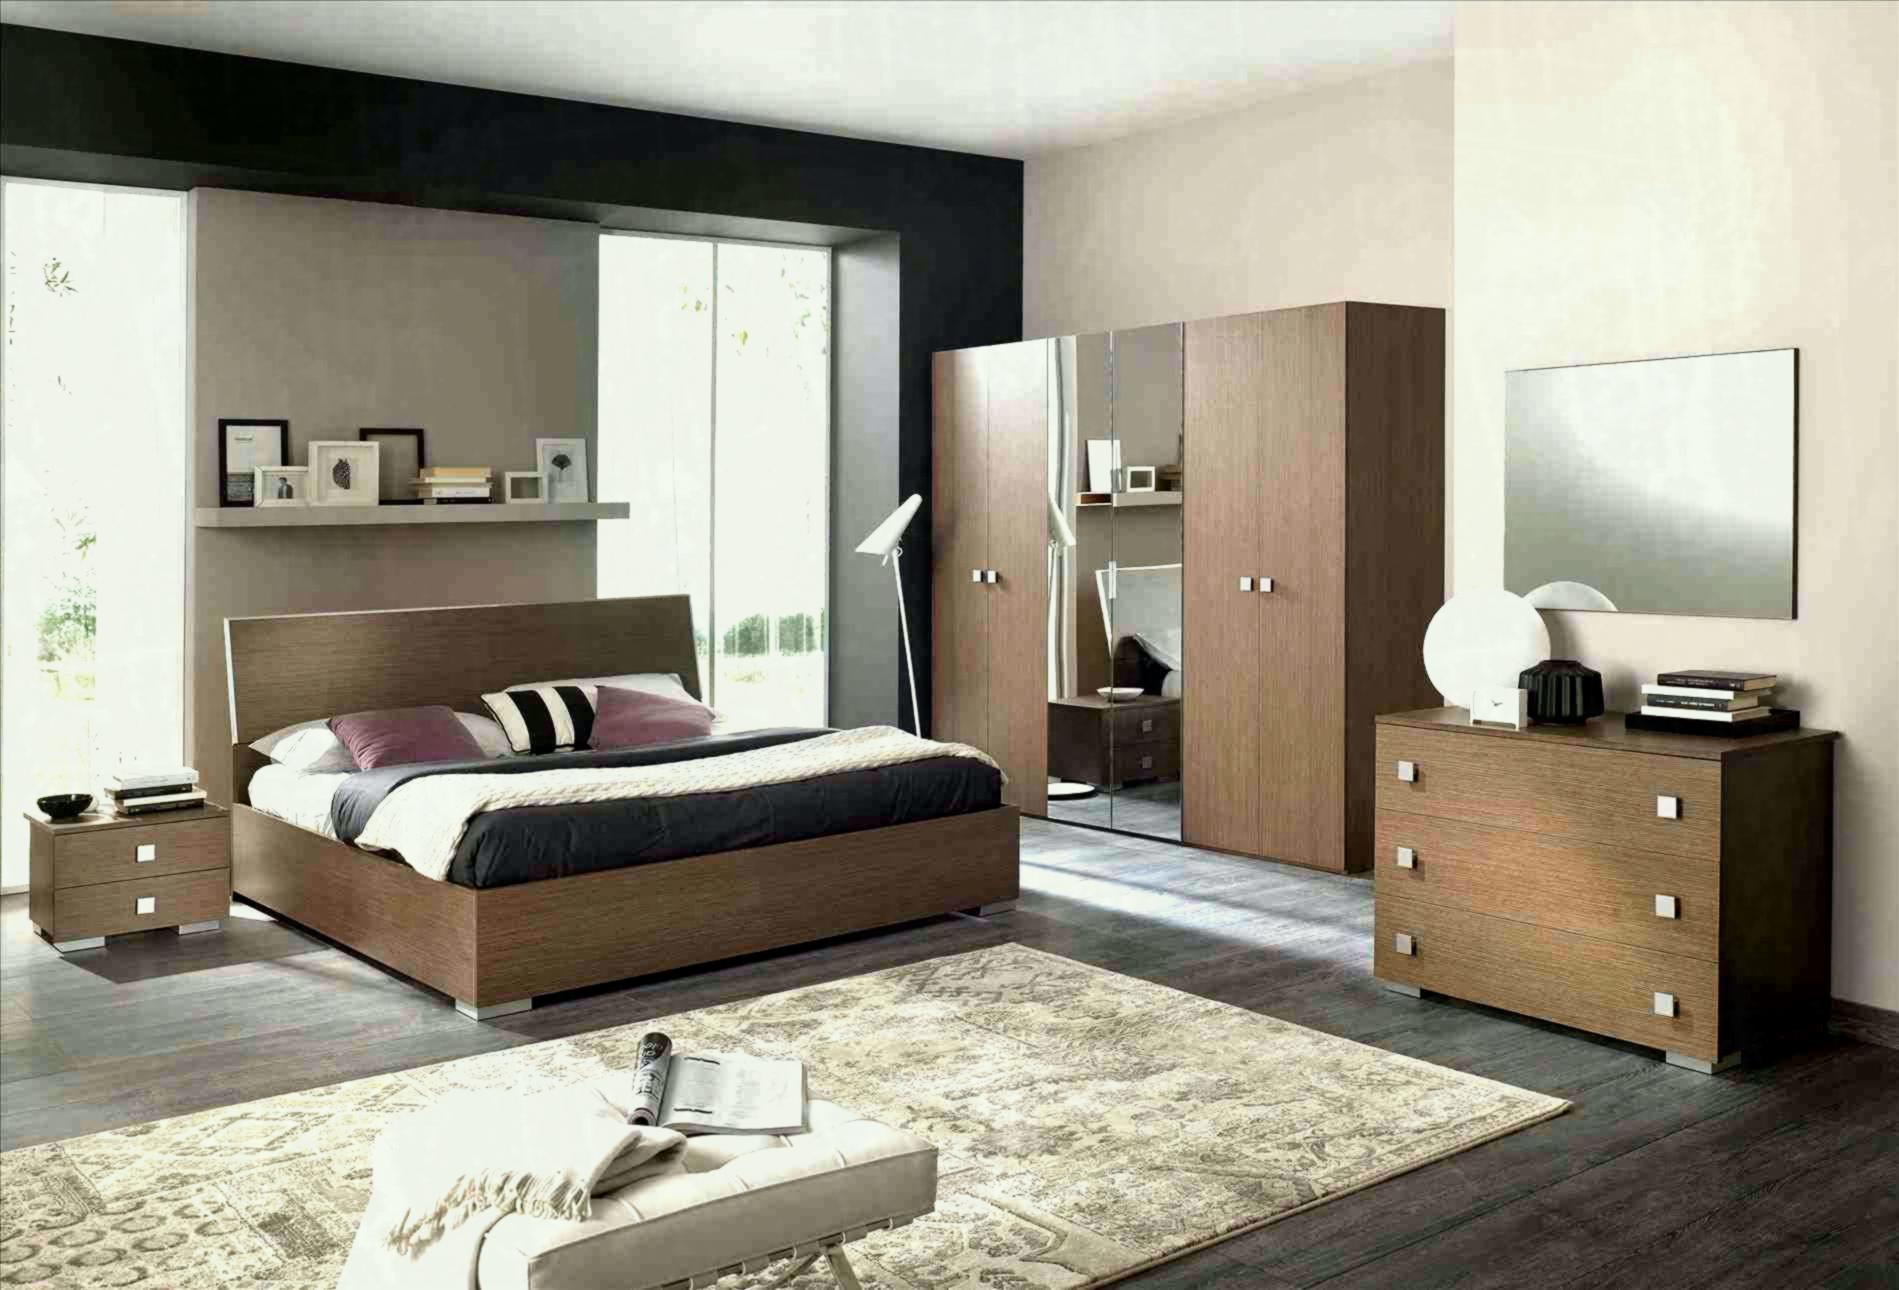 room design master bedroom 10 David Collins Master Bedroom Ideas bedroom furniture designs x room bed design king sets indian box awesome setup ideas gallery site